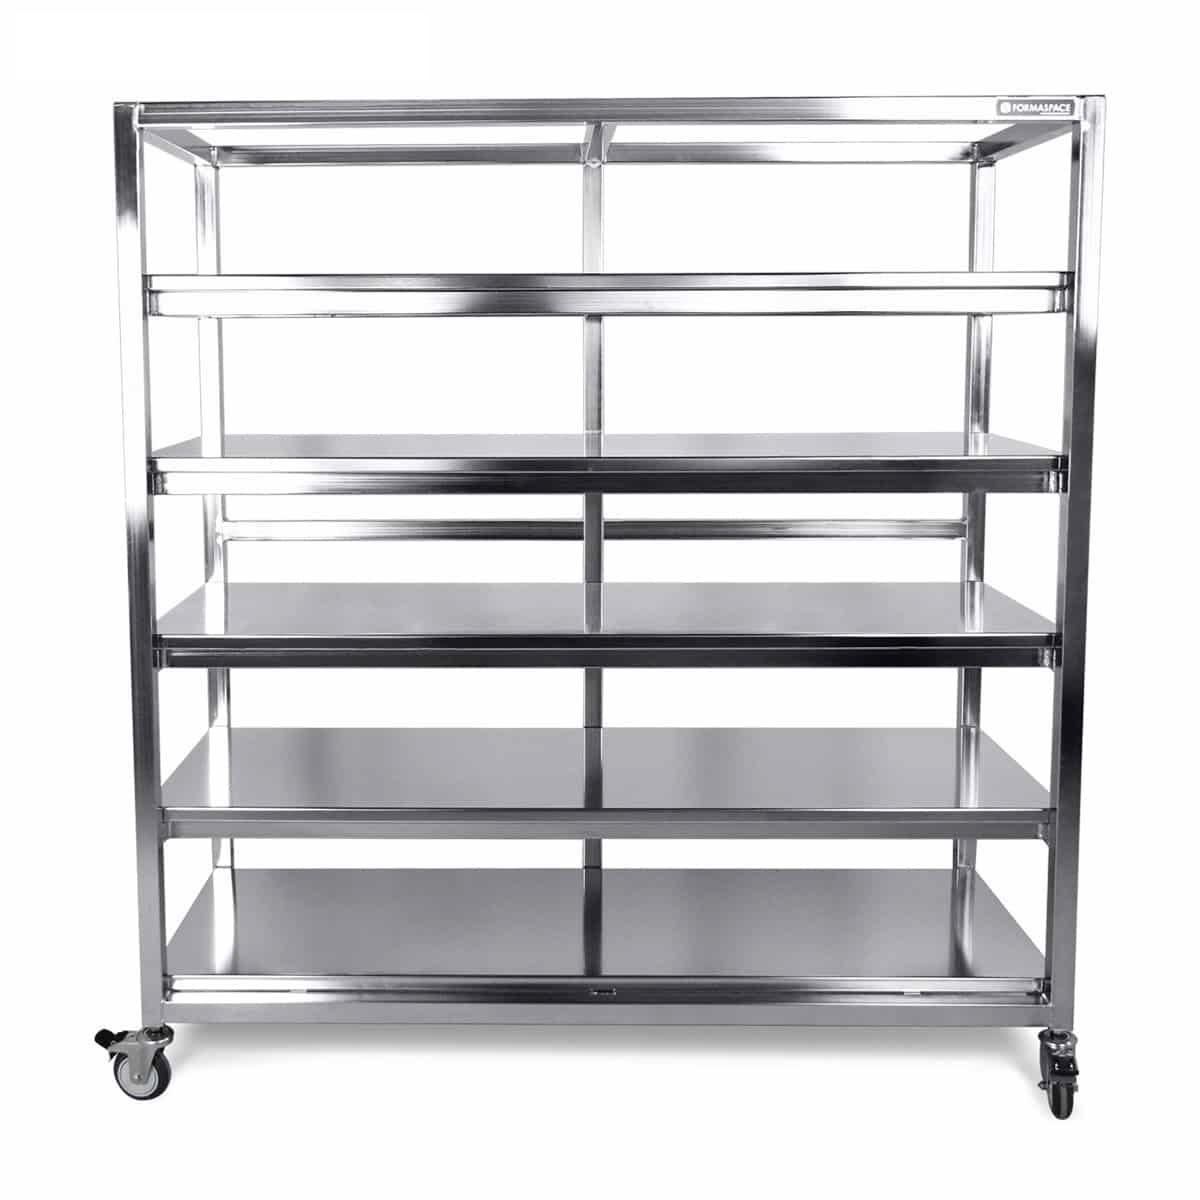 stainless steel fixed shelves